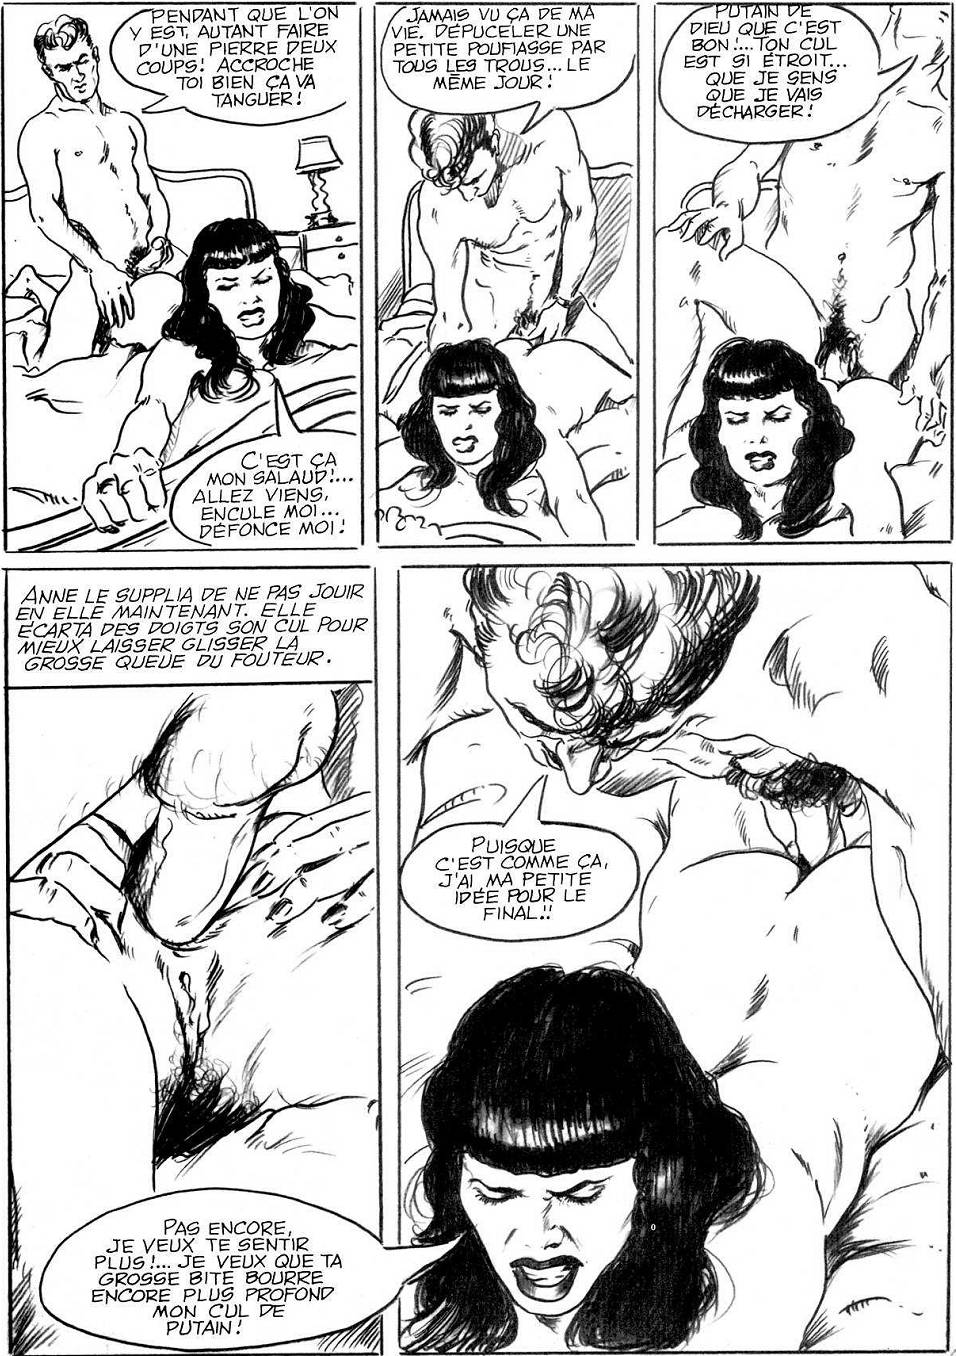 selena gomez sexe le sexe de la bande dessinée